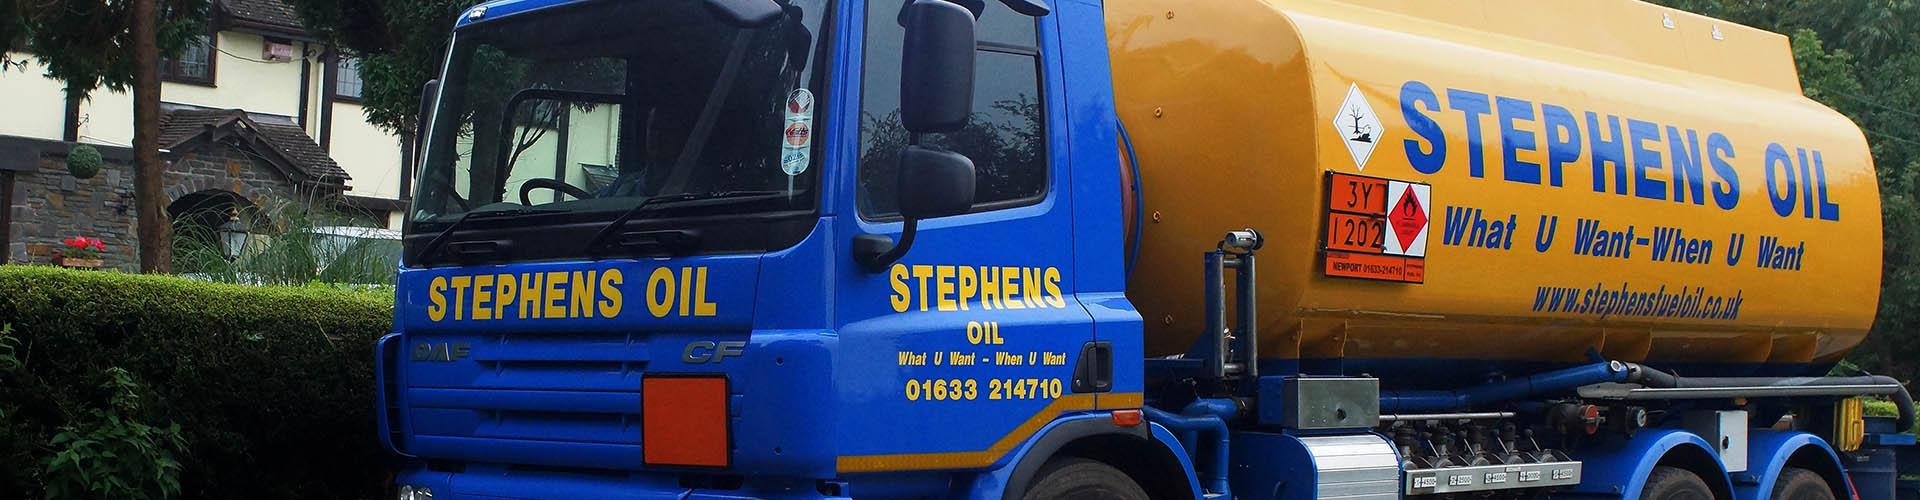 Stephens Fuel Oil truck